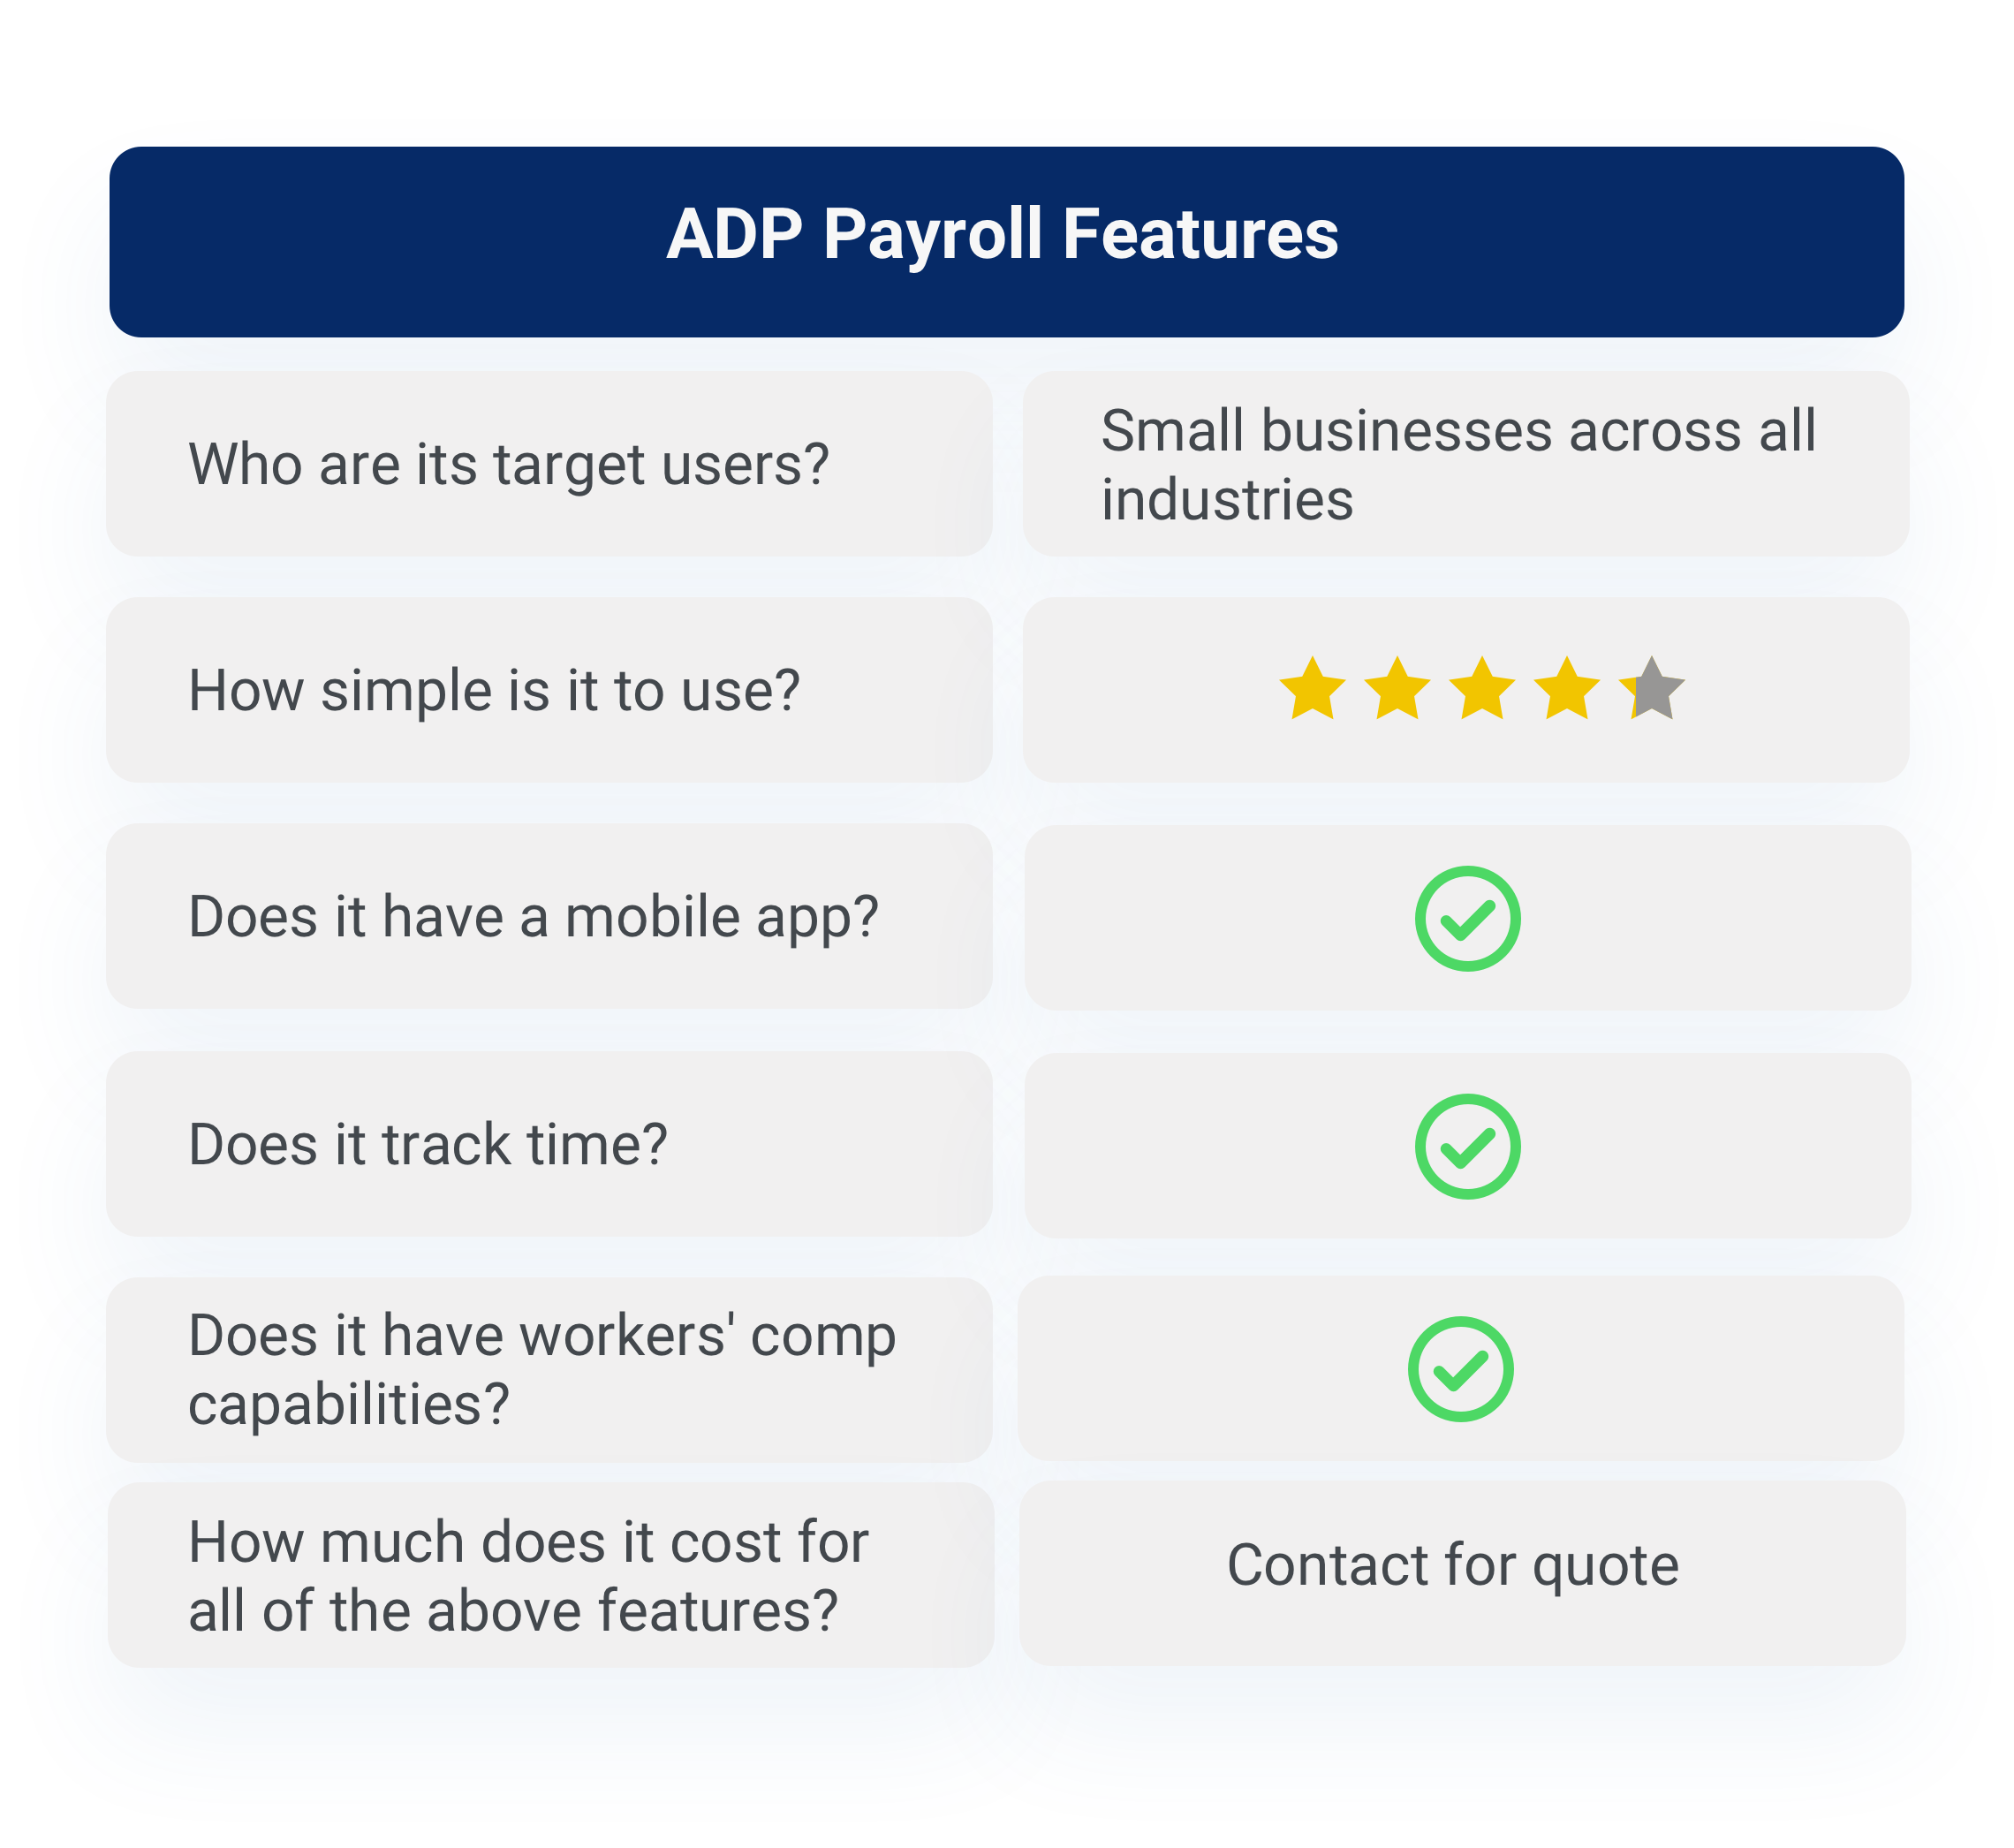 ADP features breakdown